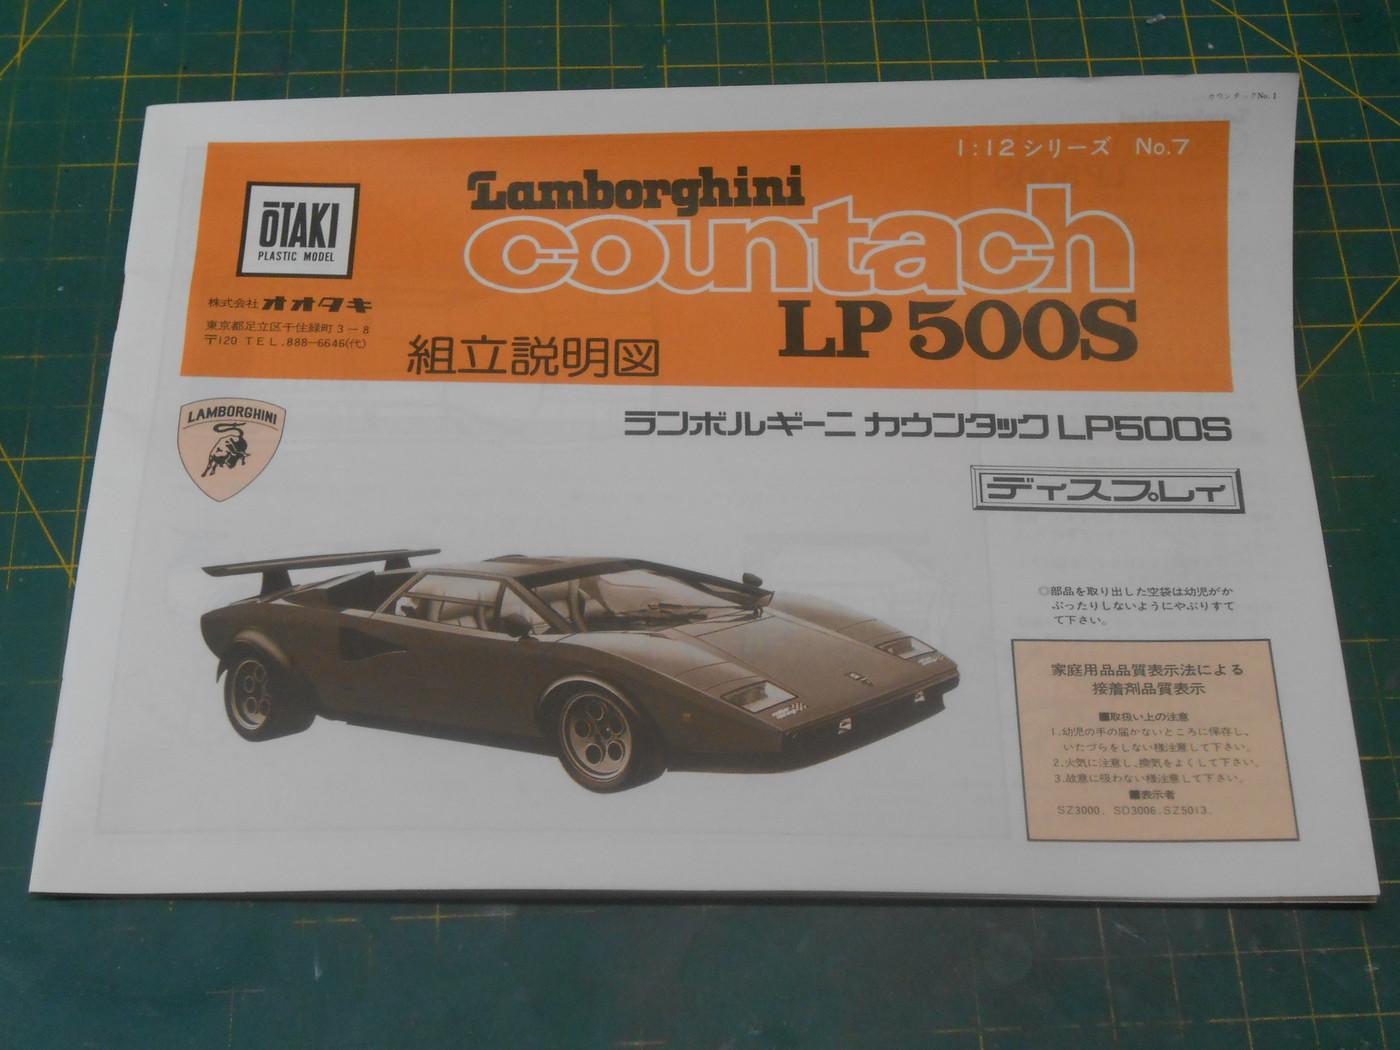 Lamborghini Countach LP500S 1/12 2v2EArpUFxaTfRW